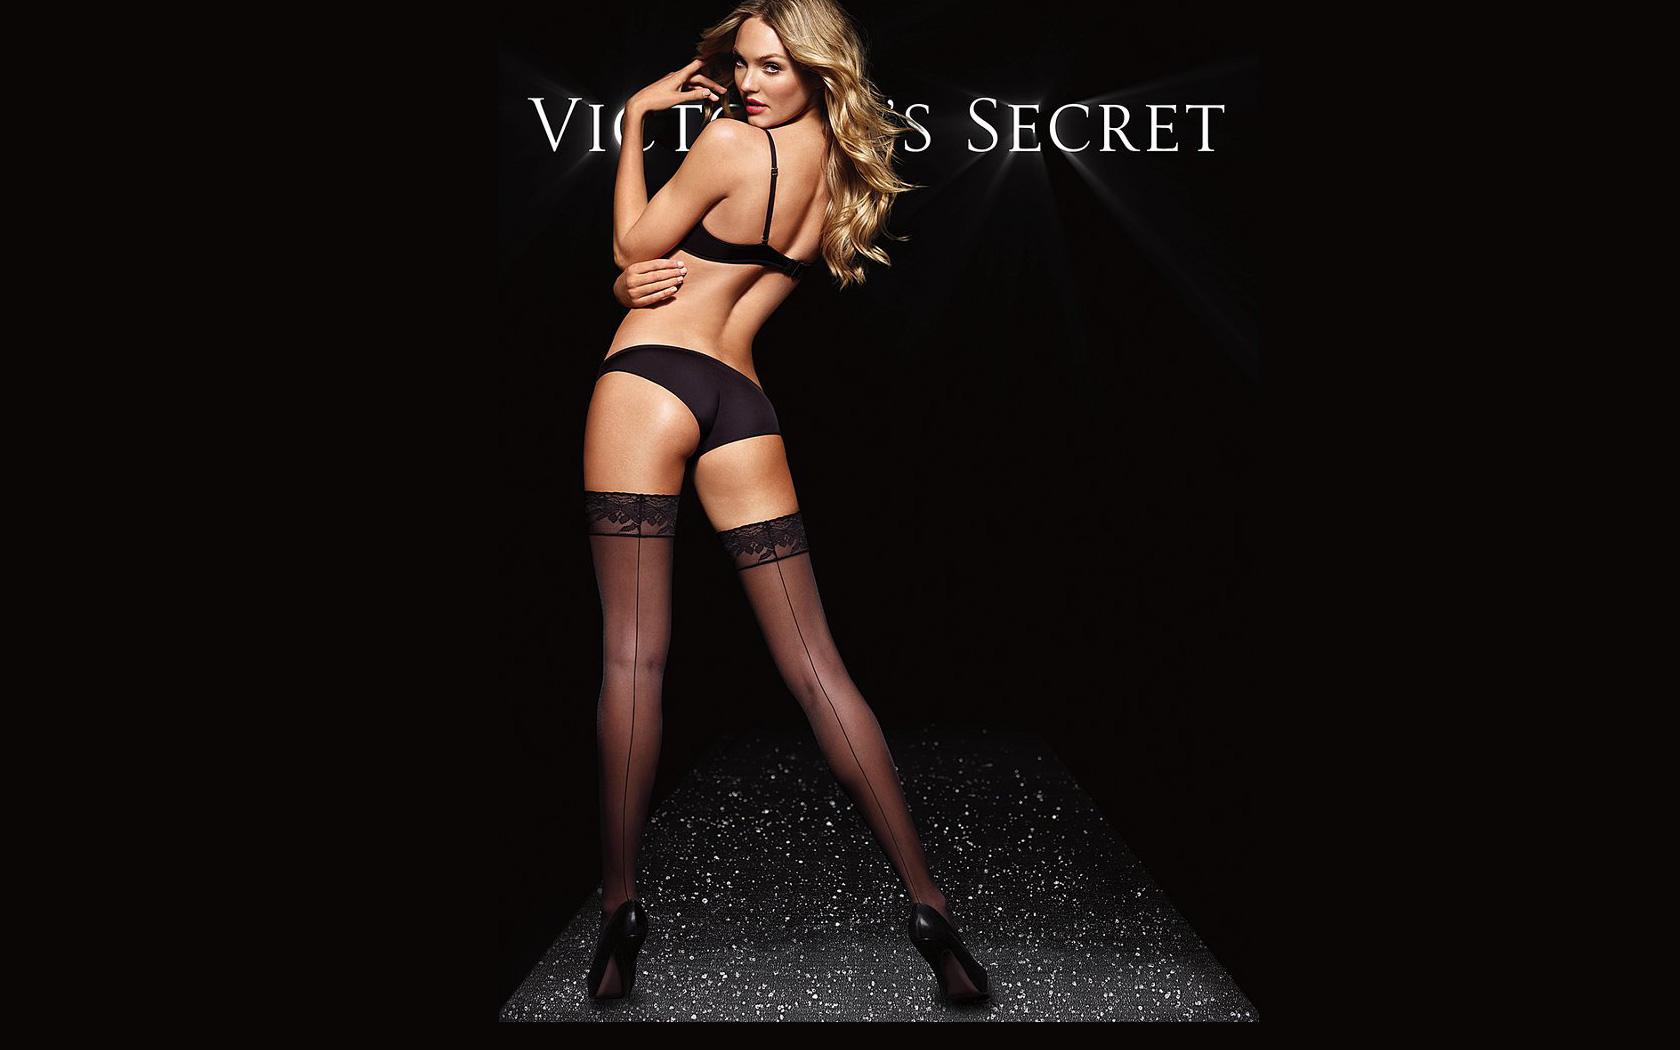 victorias secret 2